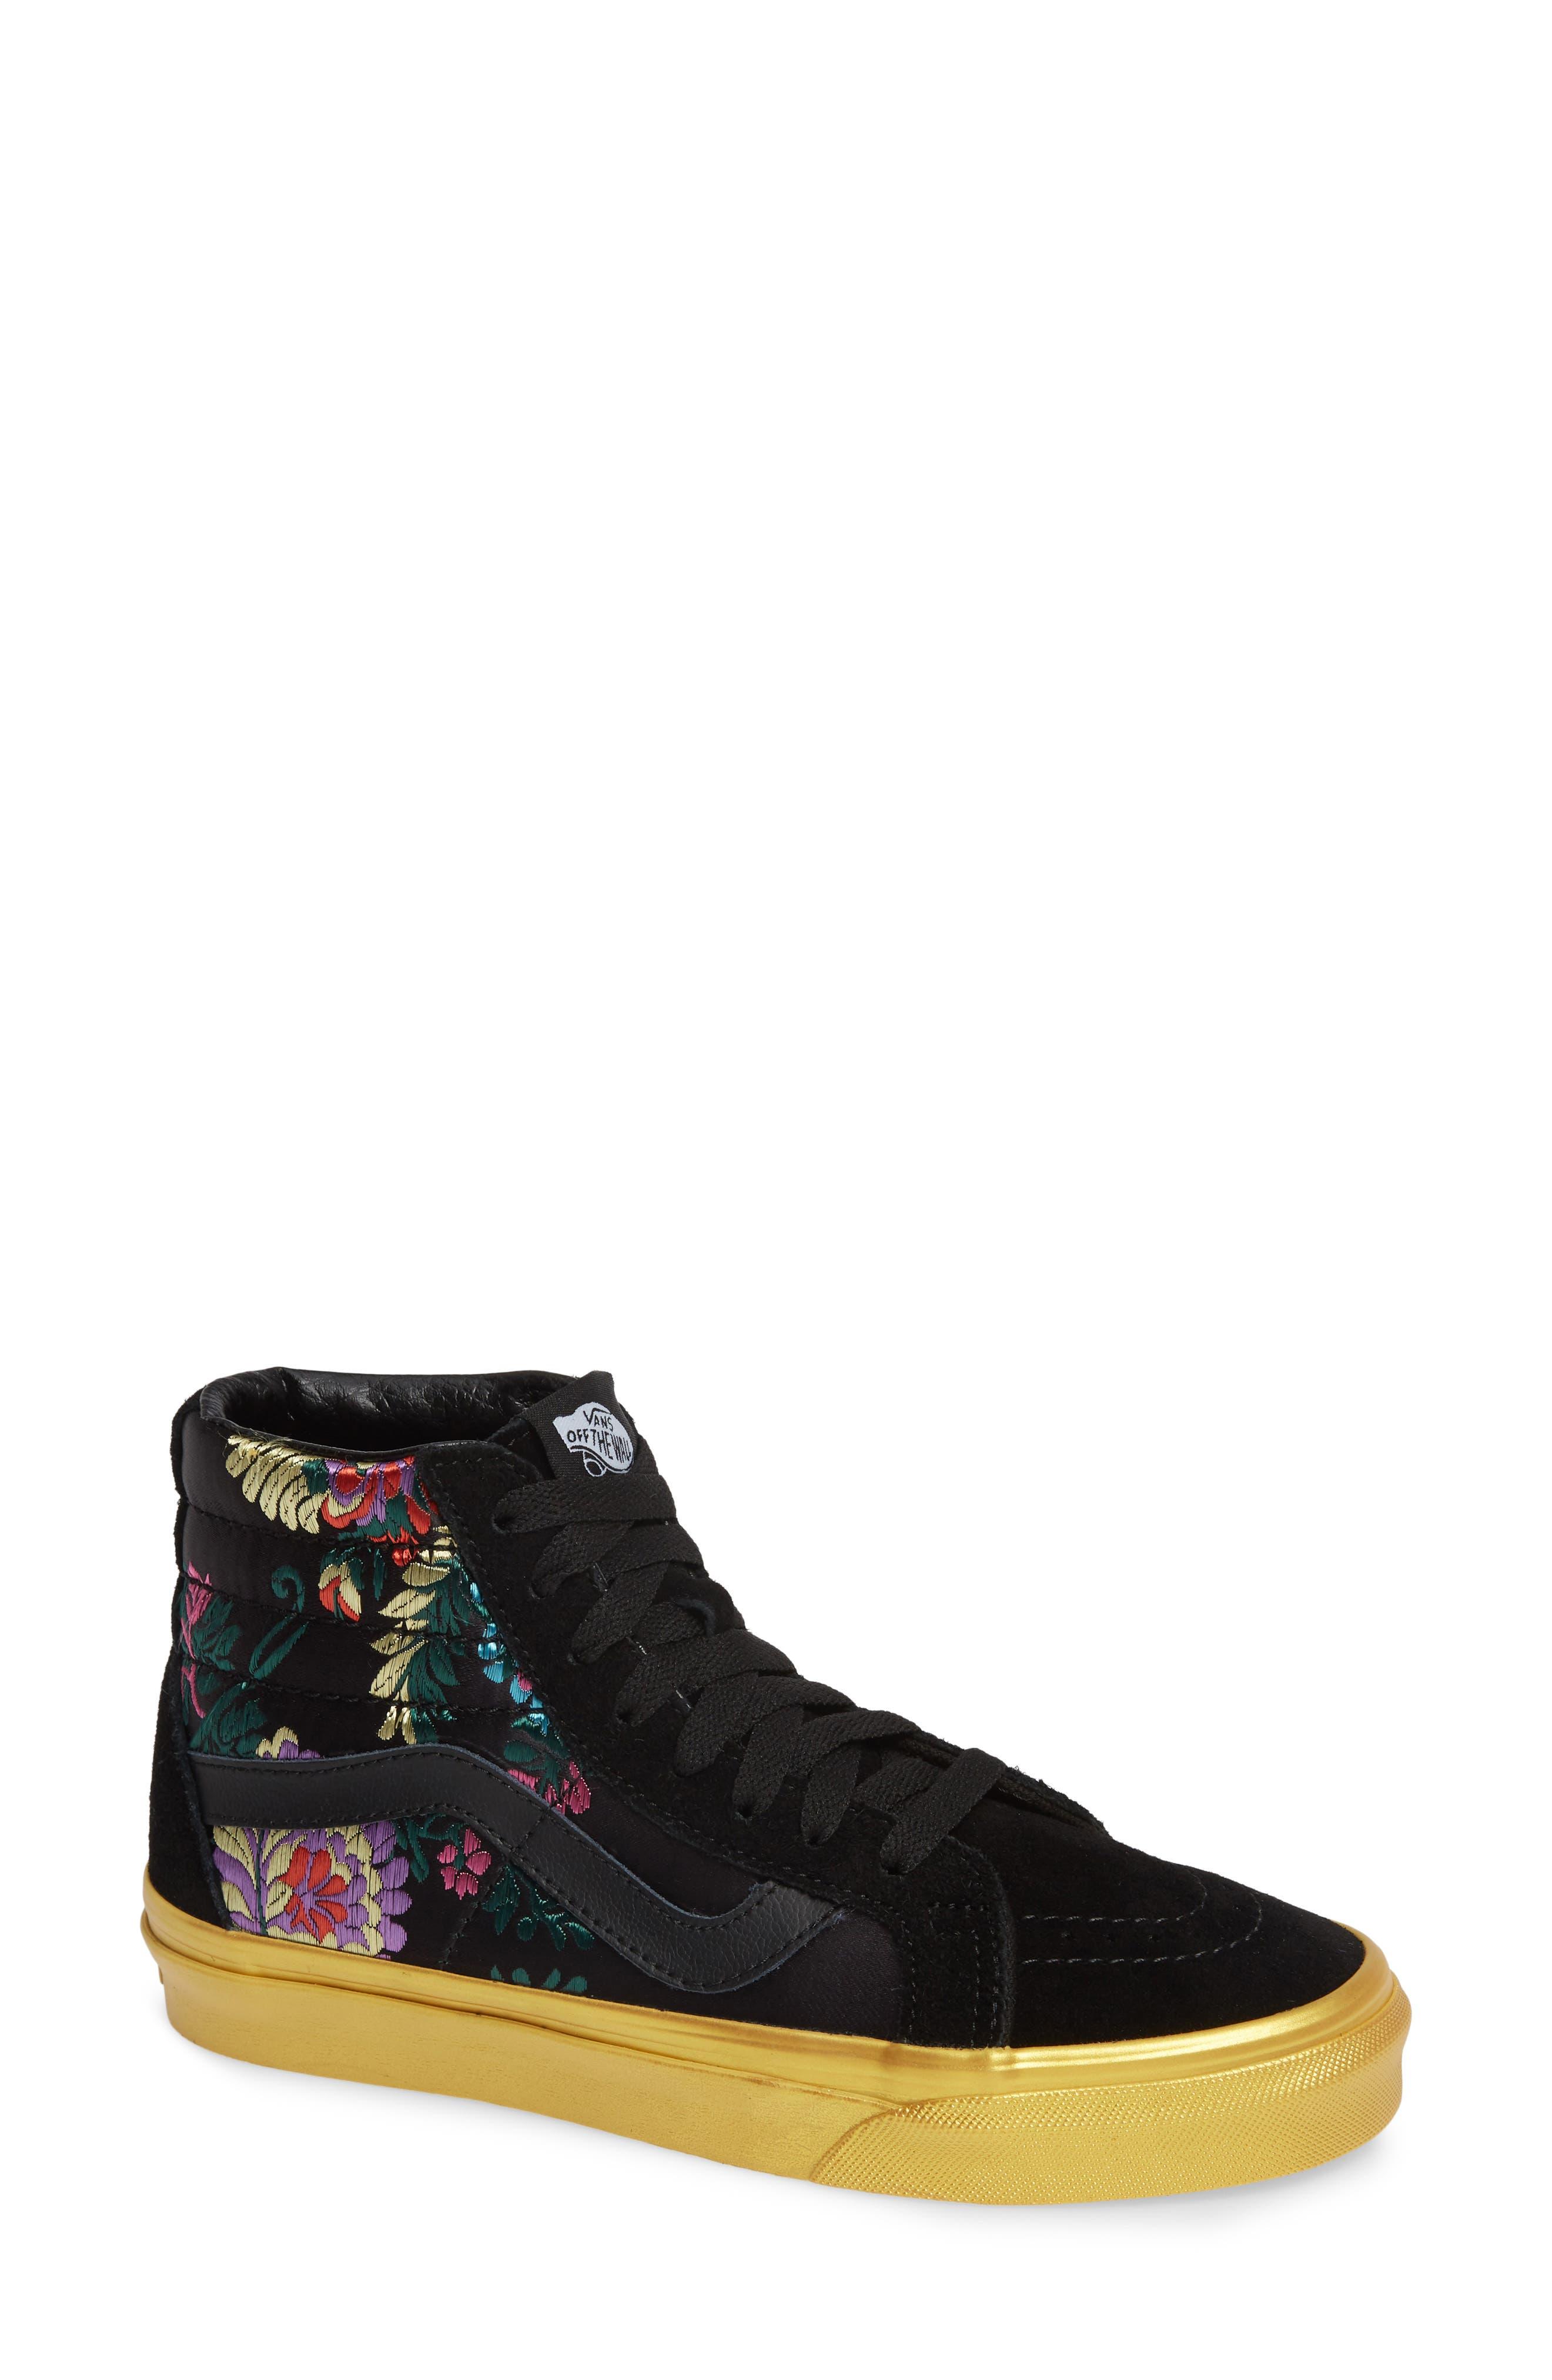 'Sk8-Hi Reissue' Sneaker,                             Main thumbnail 1, color,                             006